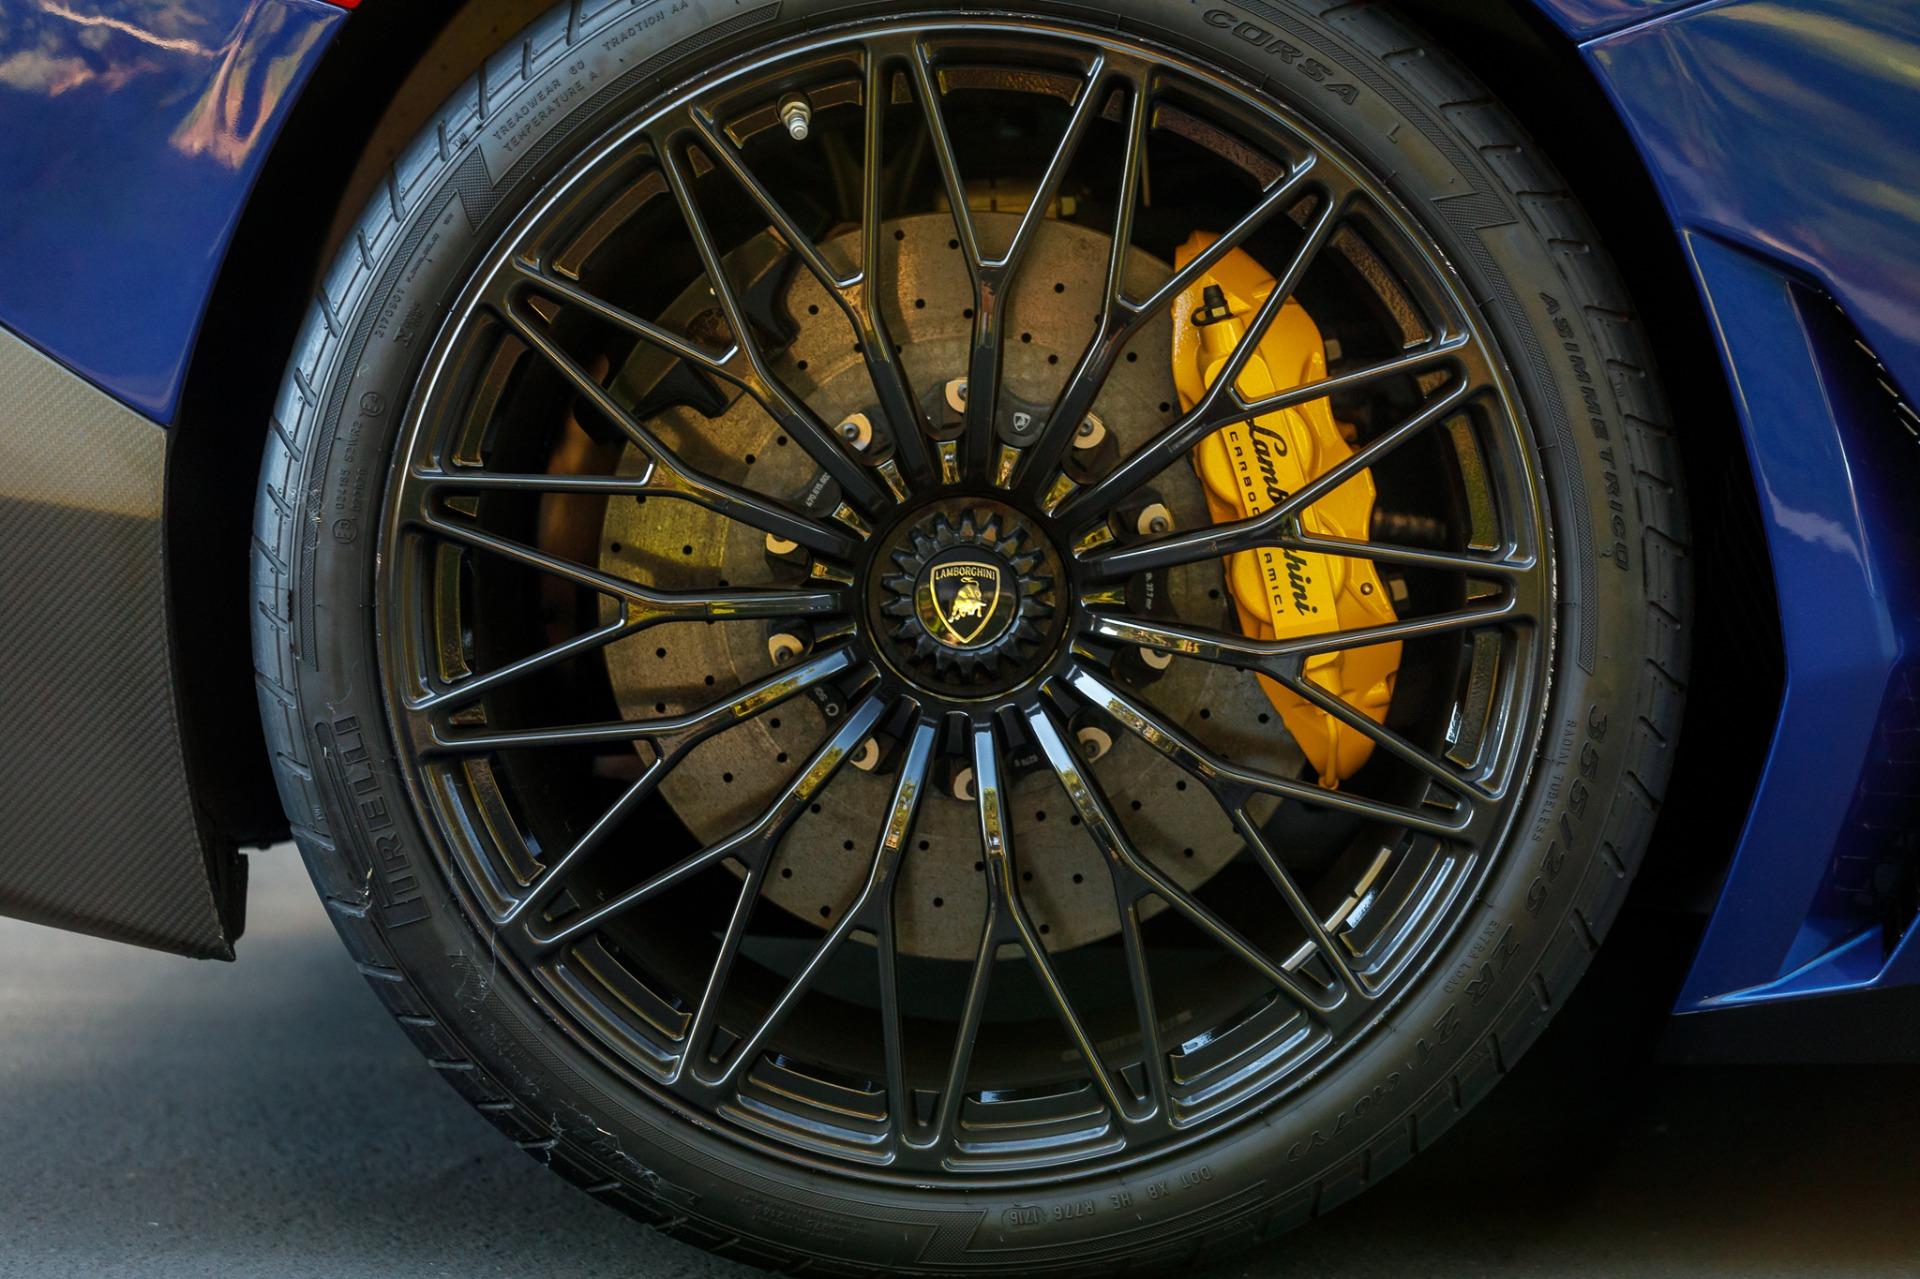 Used 2017 Lamborghini Aventador LP 750-4 SV / 740HP / AWD / 1930 MI / NAV / CAMERA for sale Sold at Formula Imports in Charlotte NC 28227 21